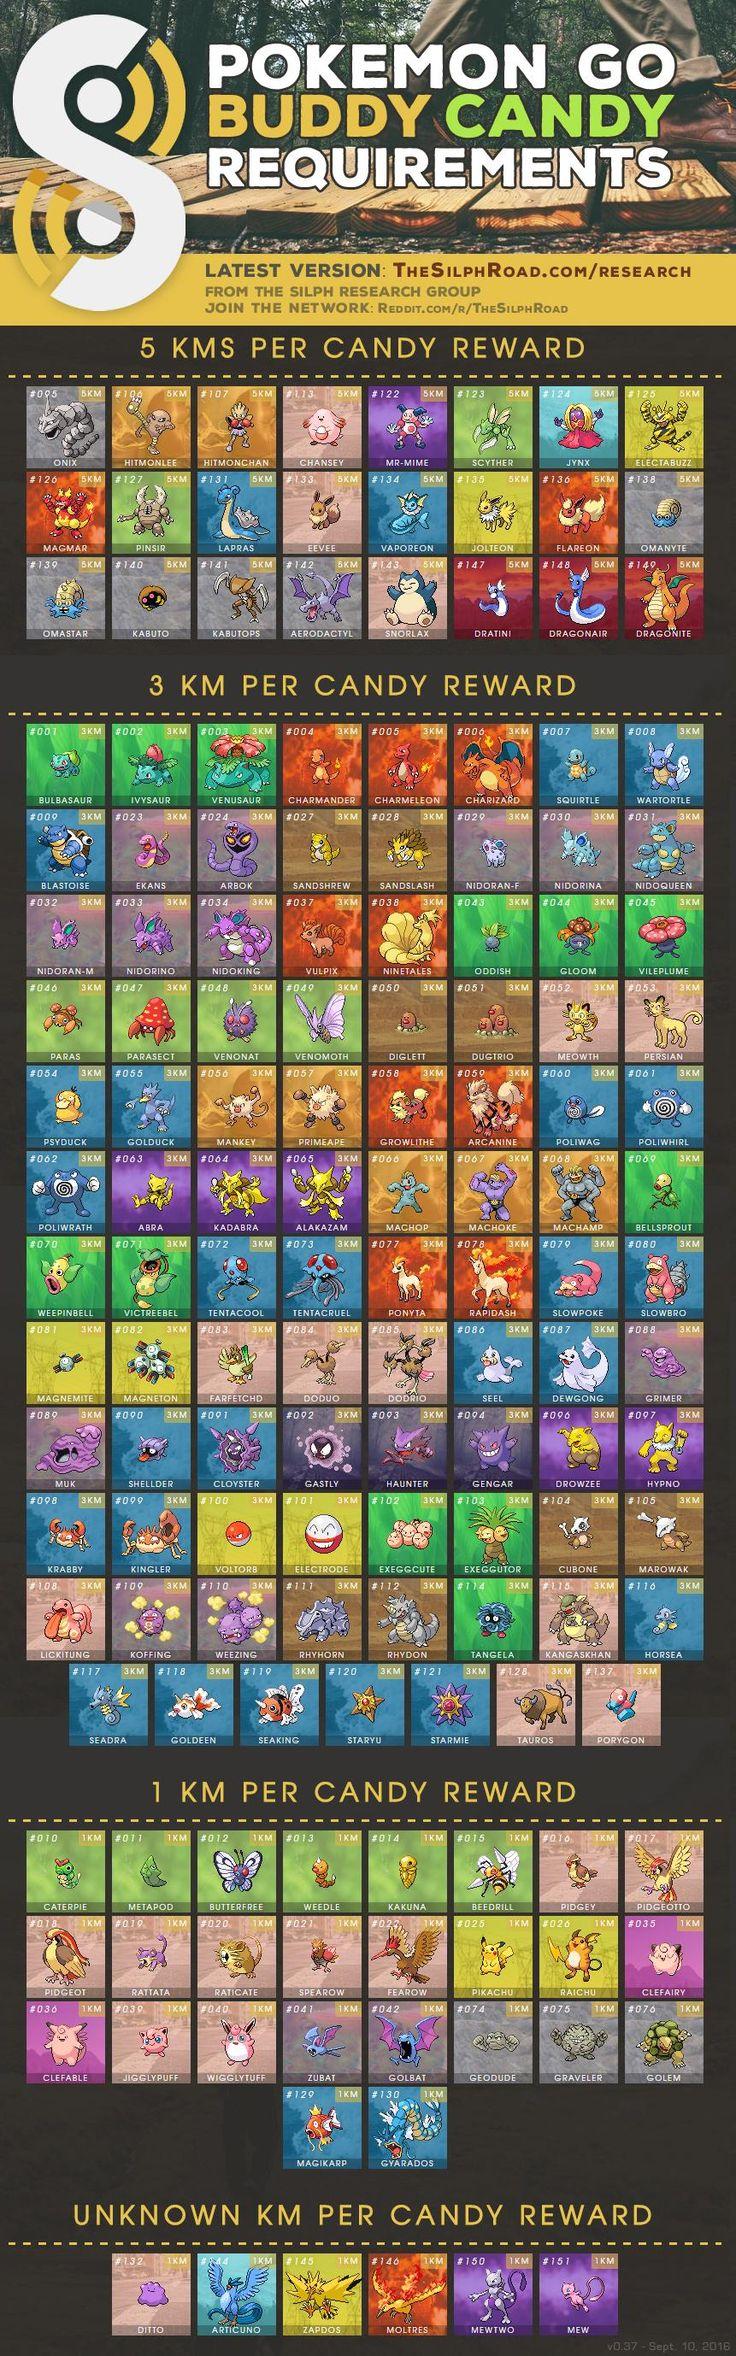 Get unlimited Pokécoins! Get it here: Jennifer Gunn.coins #coins #freecoins #generator #good #cute #follow #fun #like4like #followme #pokemongo #pokemon :hotdog: